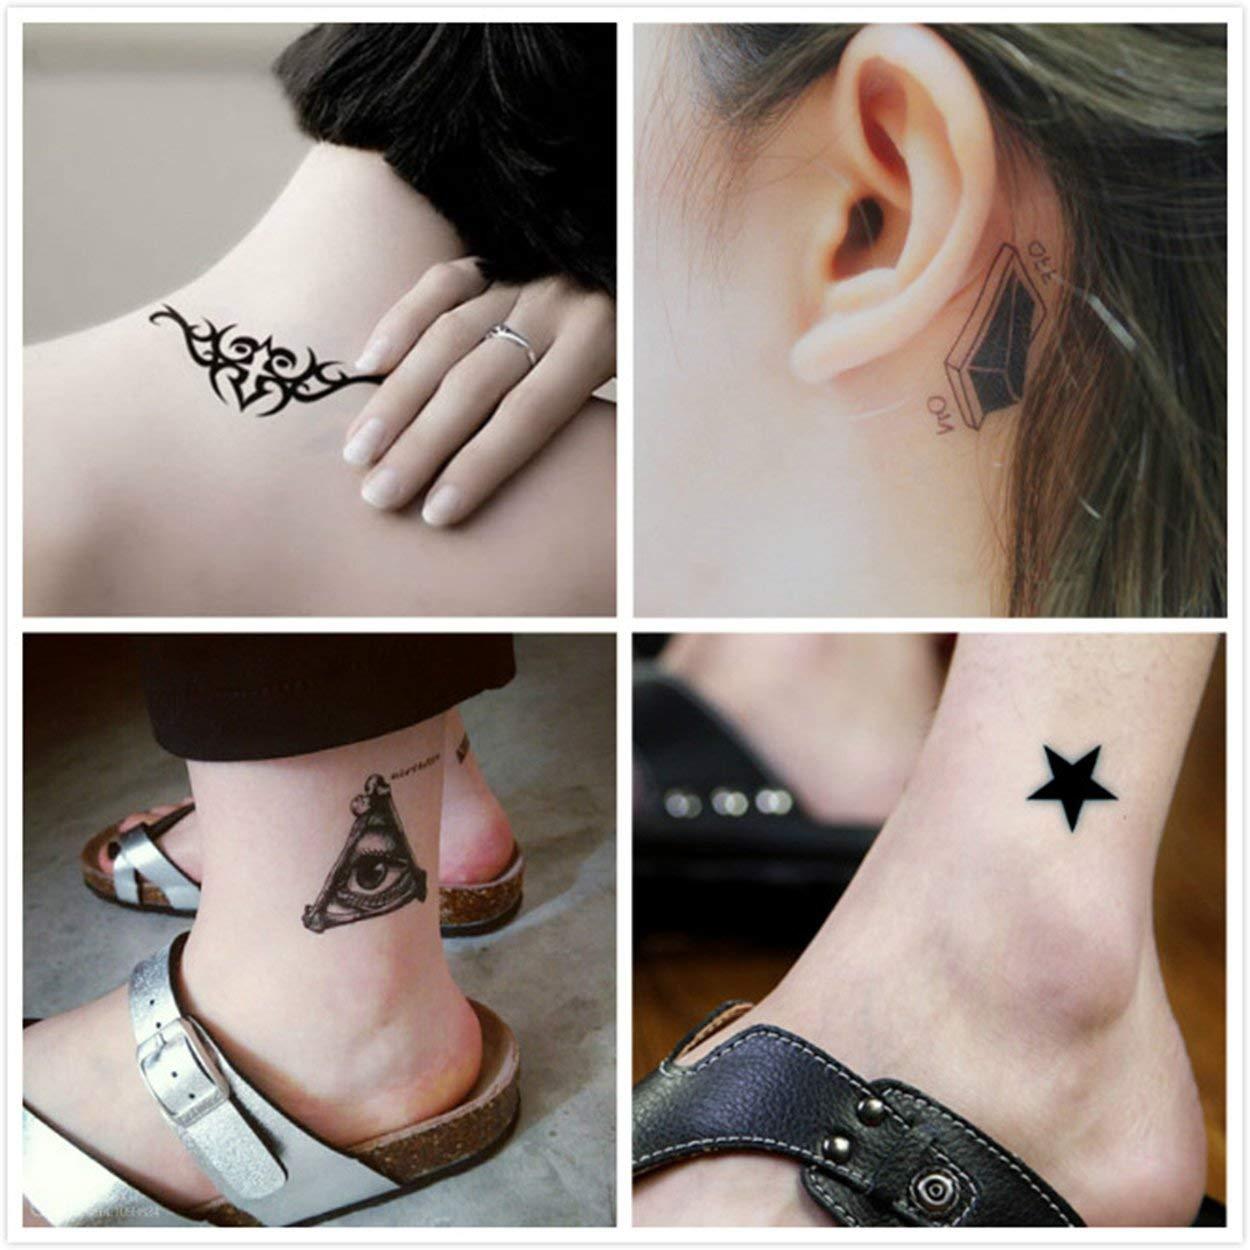 Lorenlli Estilo Profesional Tattoo Stencil Maker Máquina de ...